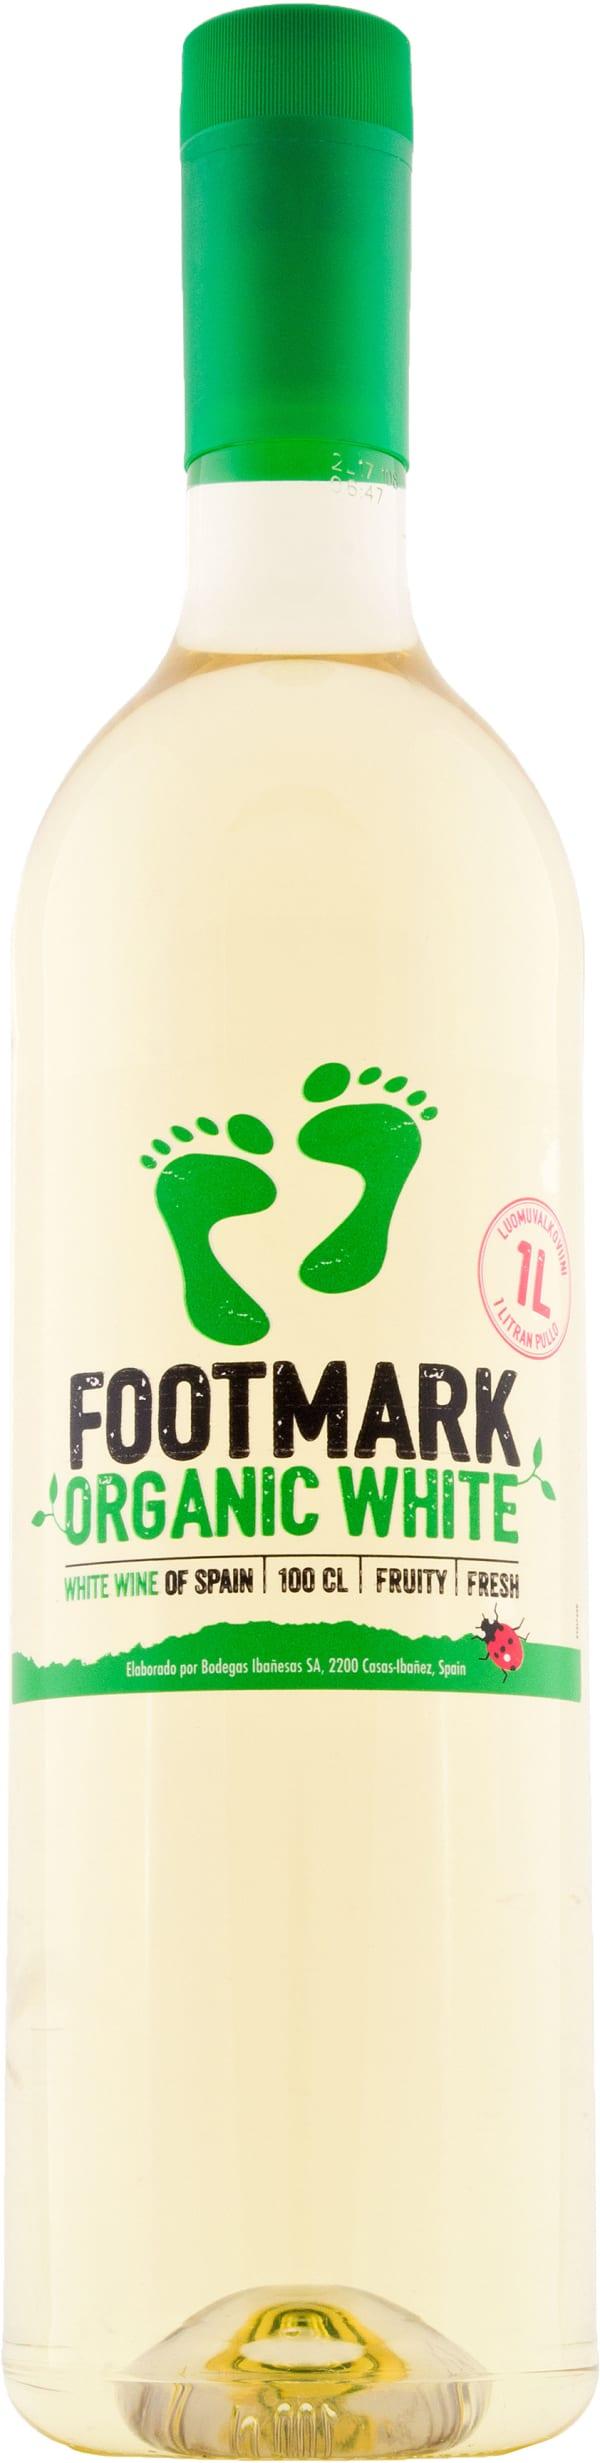 Footmark White Organic 2016 muovipullo